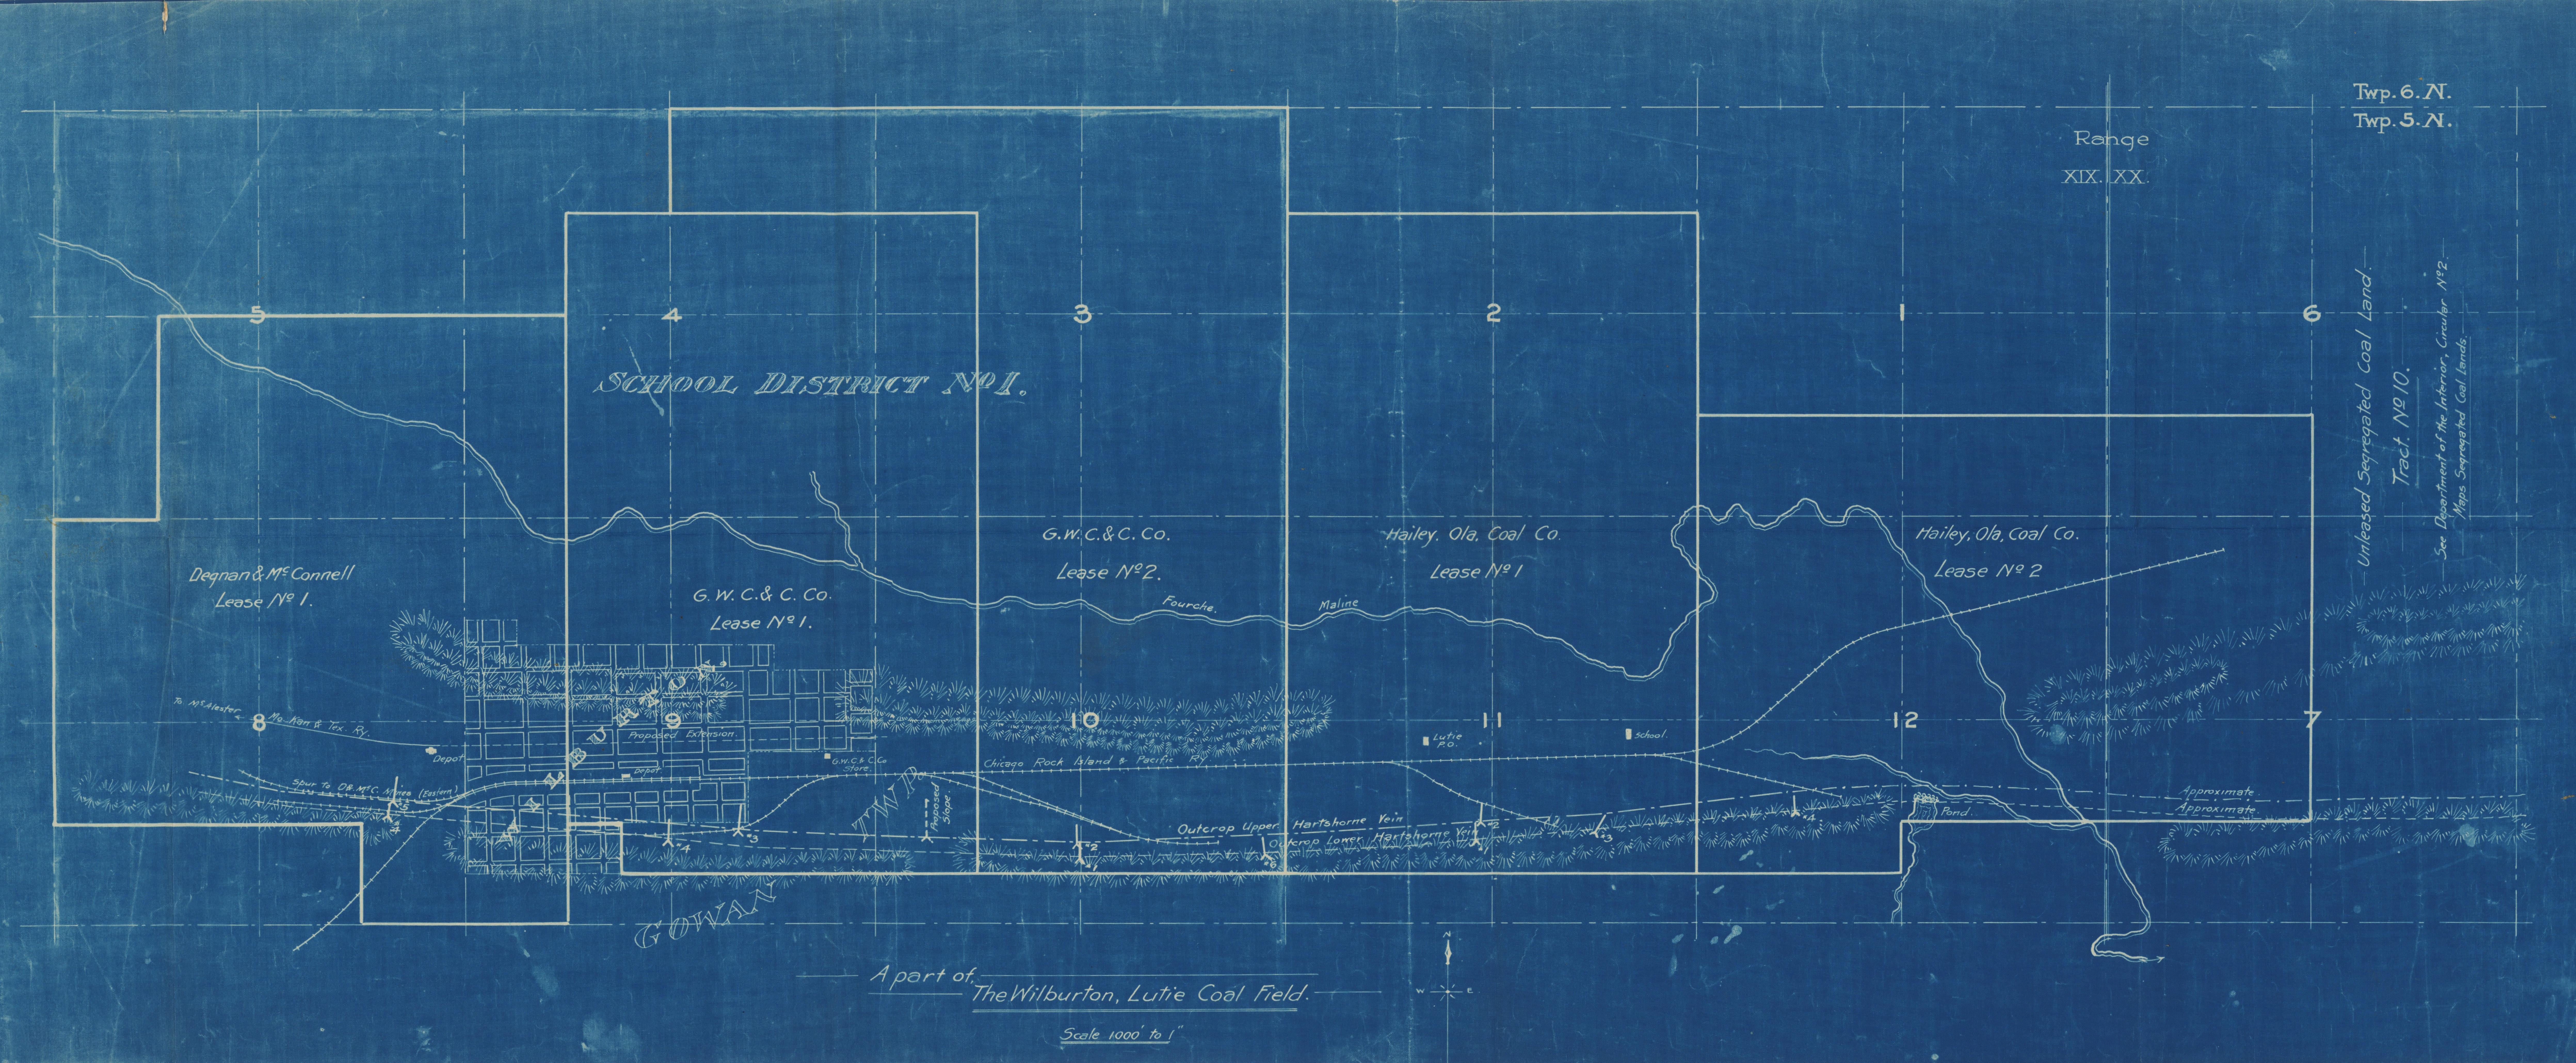 Coal mining on pitching seams blueprint 9352mb malvernweather Images